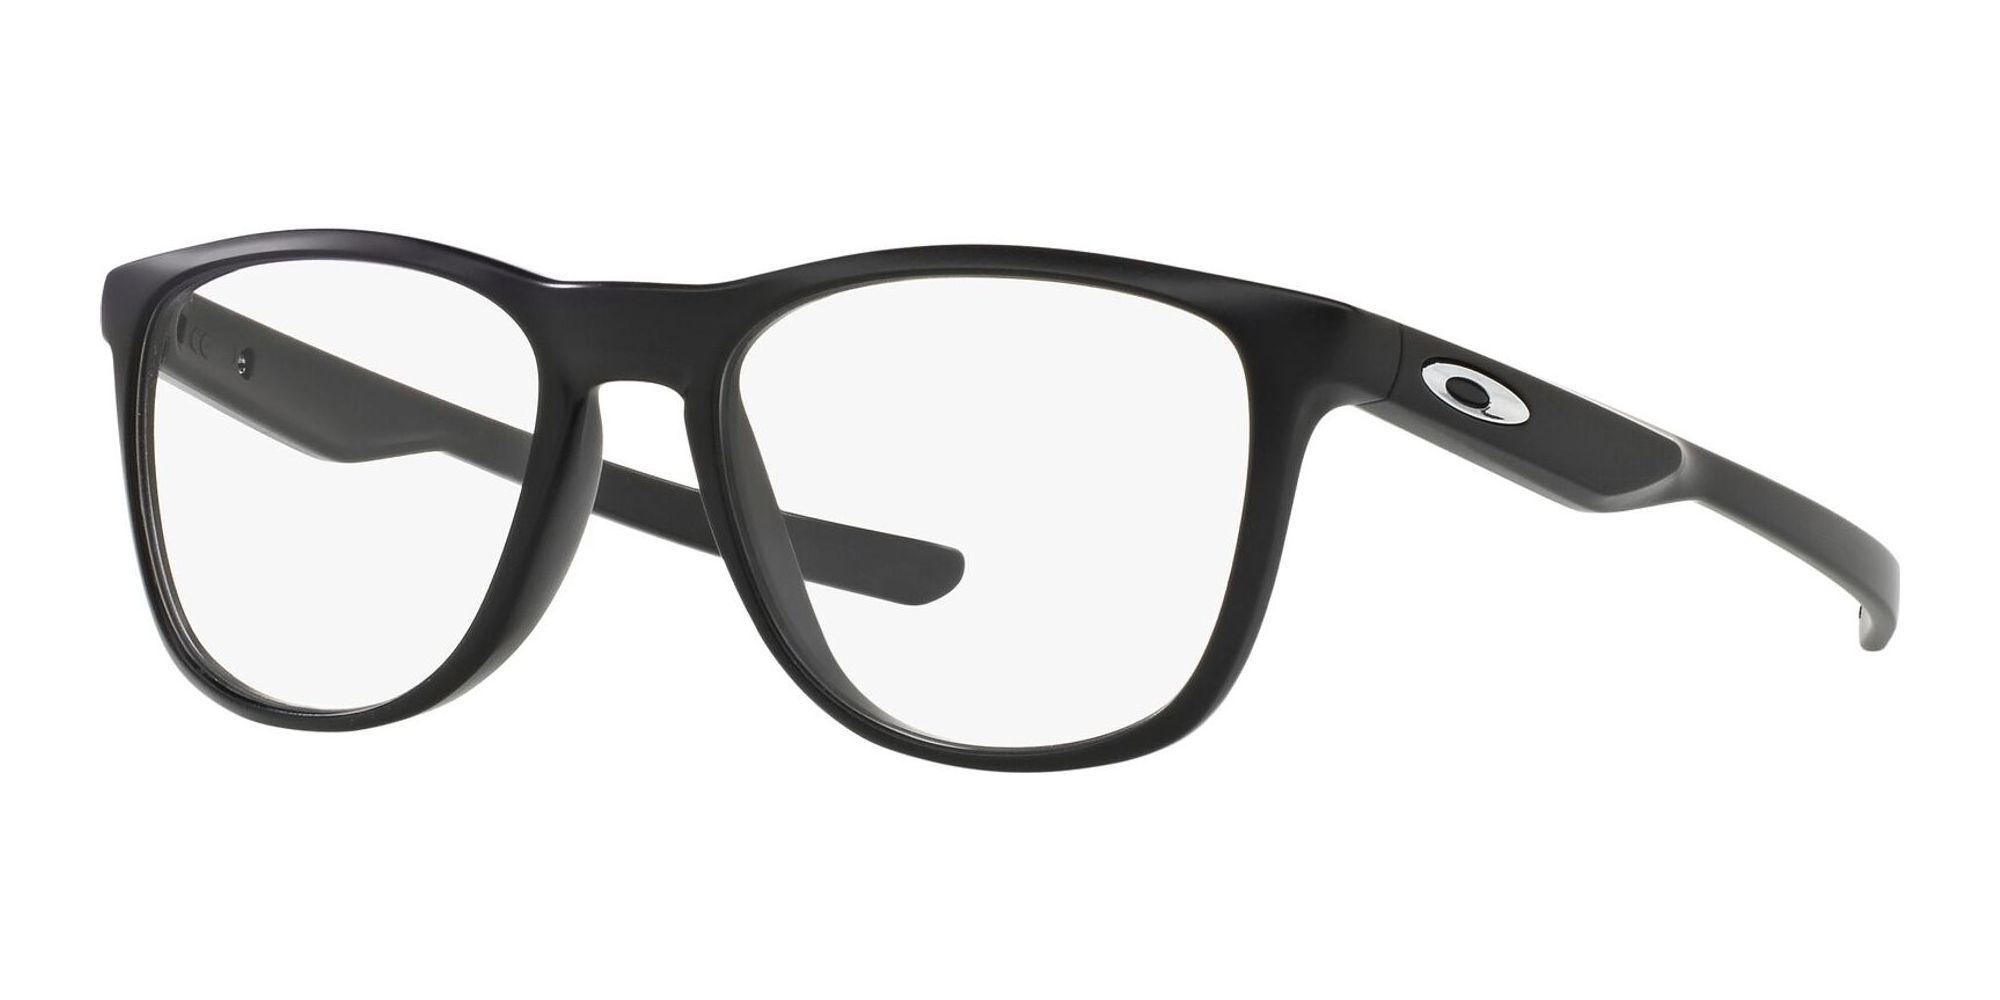 Oakley brillen RX TRILLBE X OX 8130